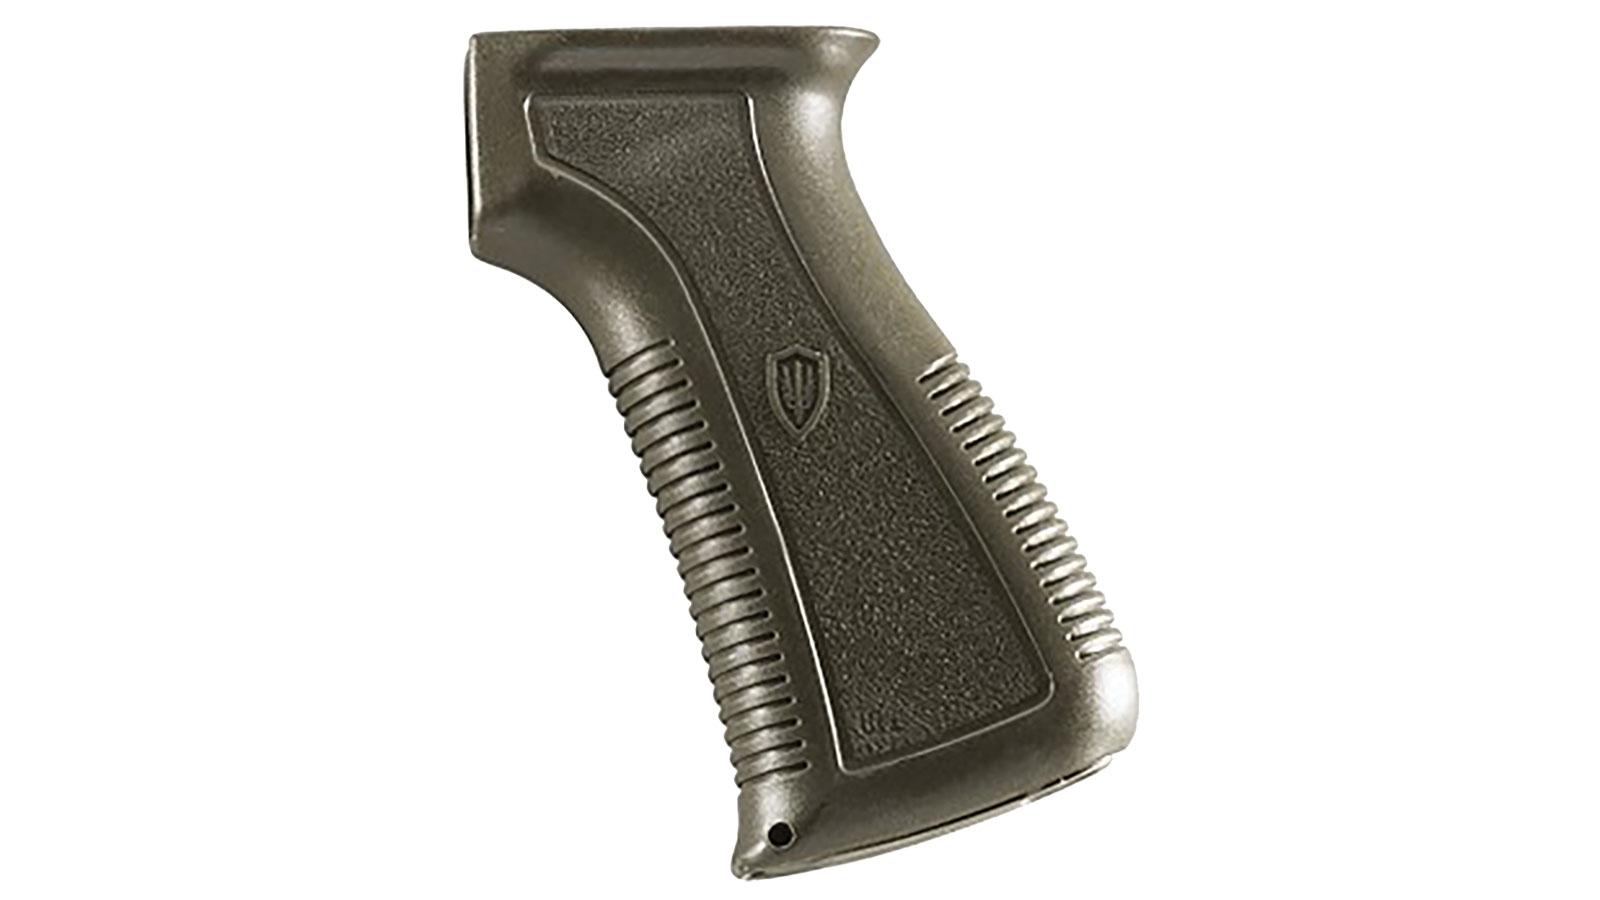 Pro Mag Industries Archangel Opfor Ak-Series Pistol Grip OD Green